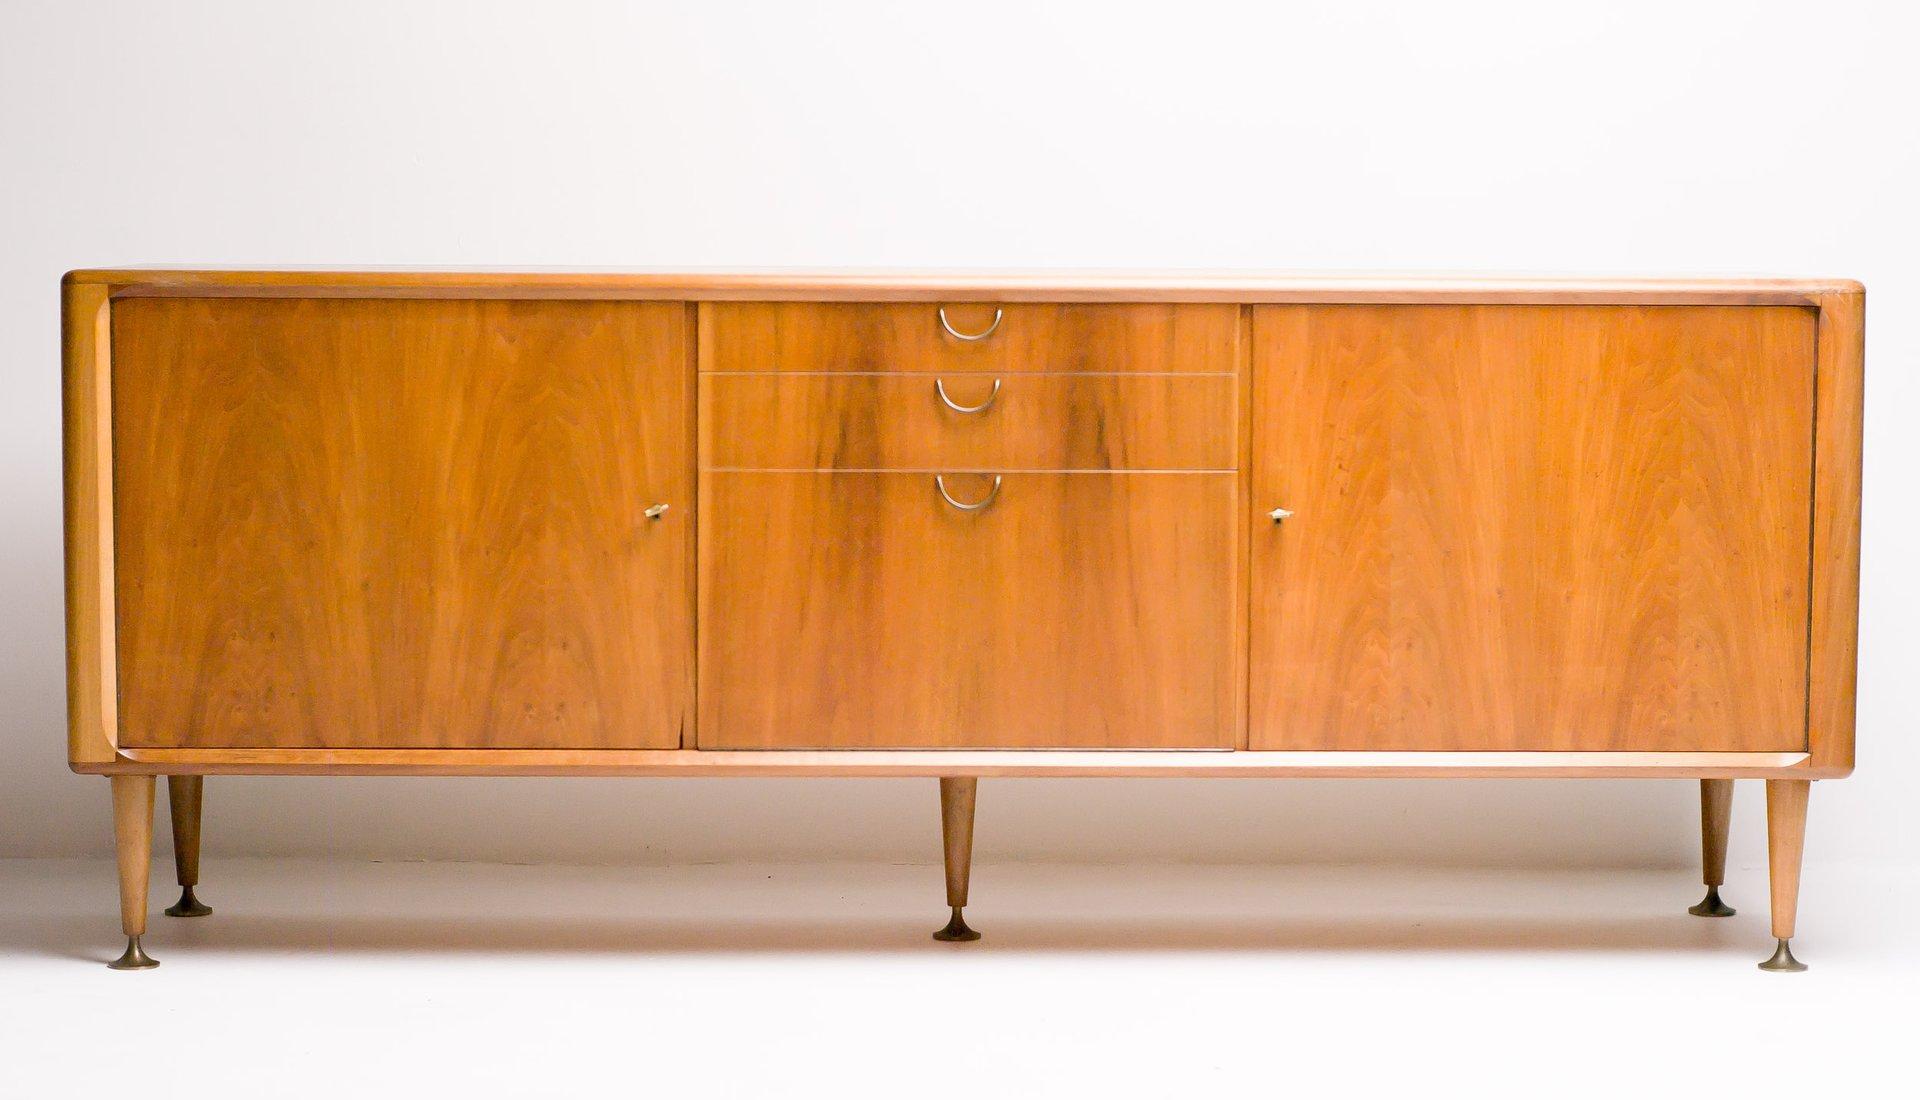 Mid Century Dutch Modern Walnut Sideboard By A. A. Patijn For Zijlstra  Joure, 1950s